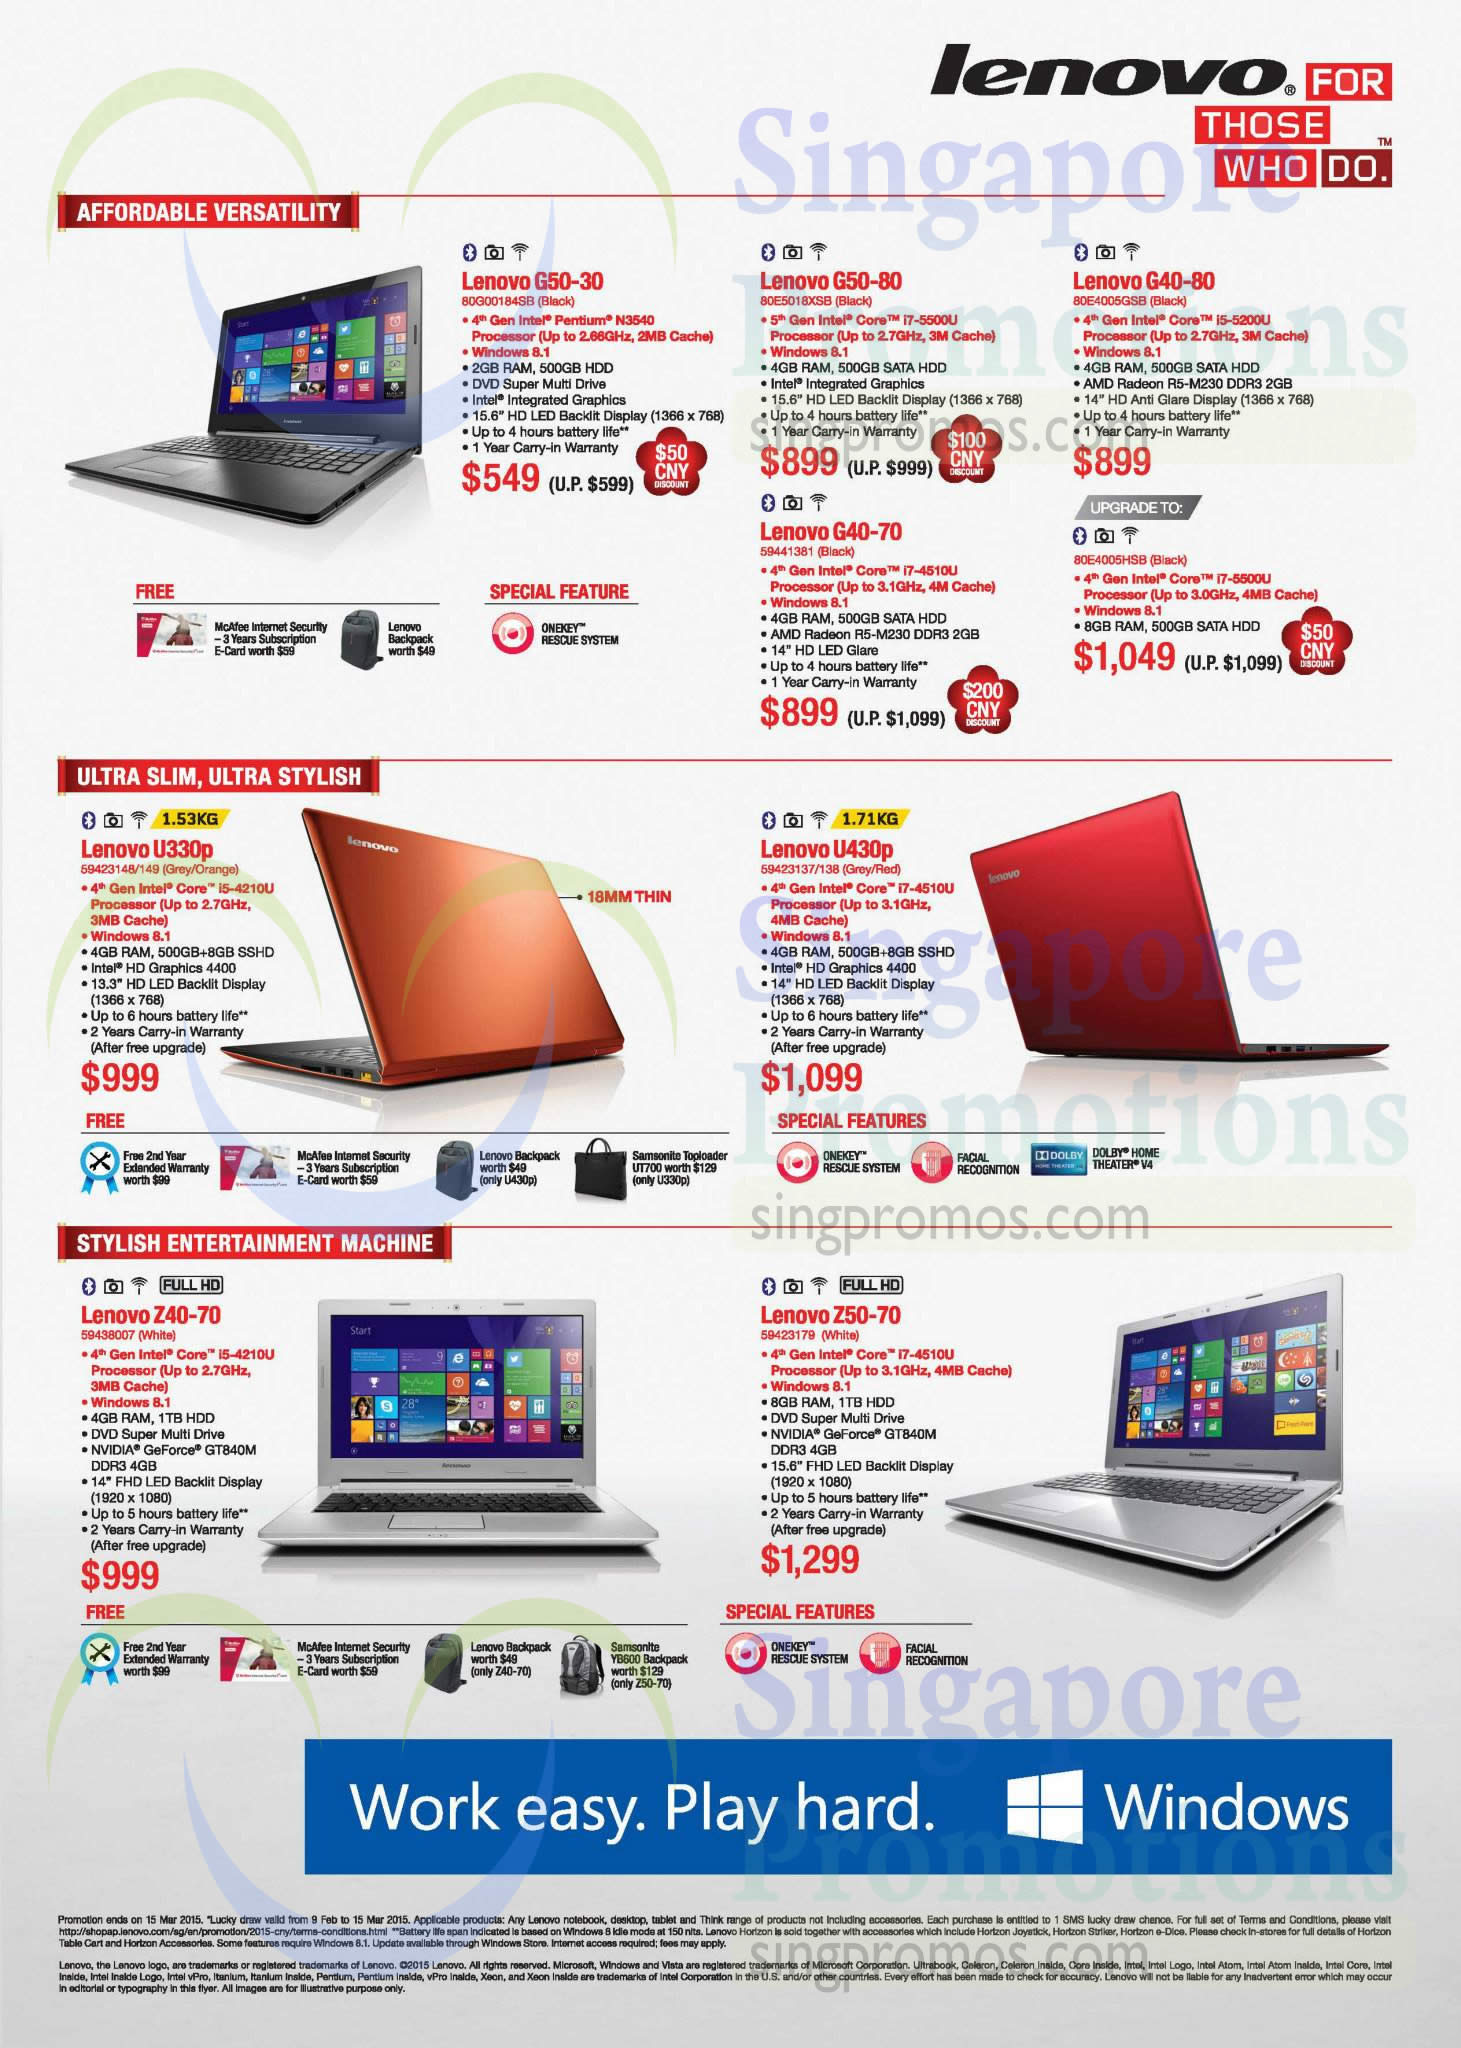 Notebooks, G50-30, G50-80, G40-80, G40-70, U330p, U430p, Z40-70, Z50-70